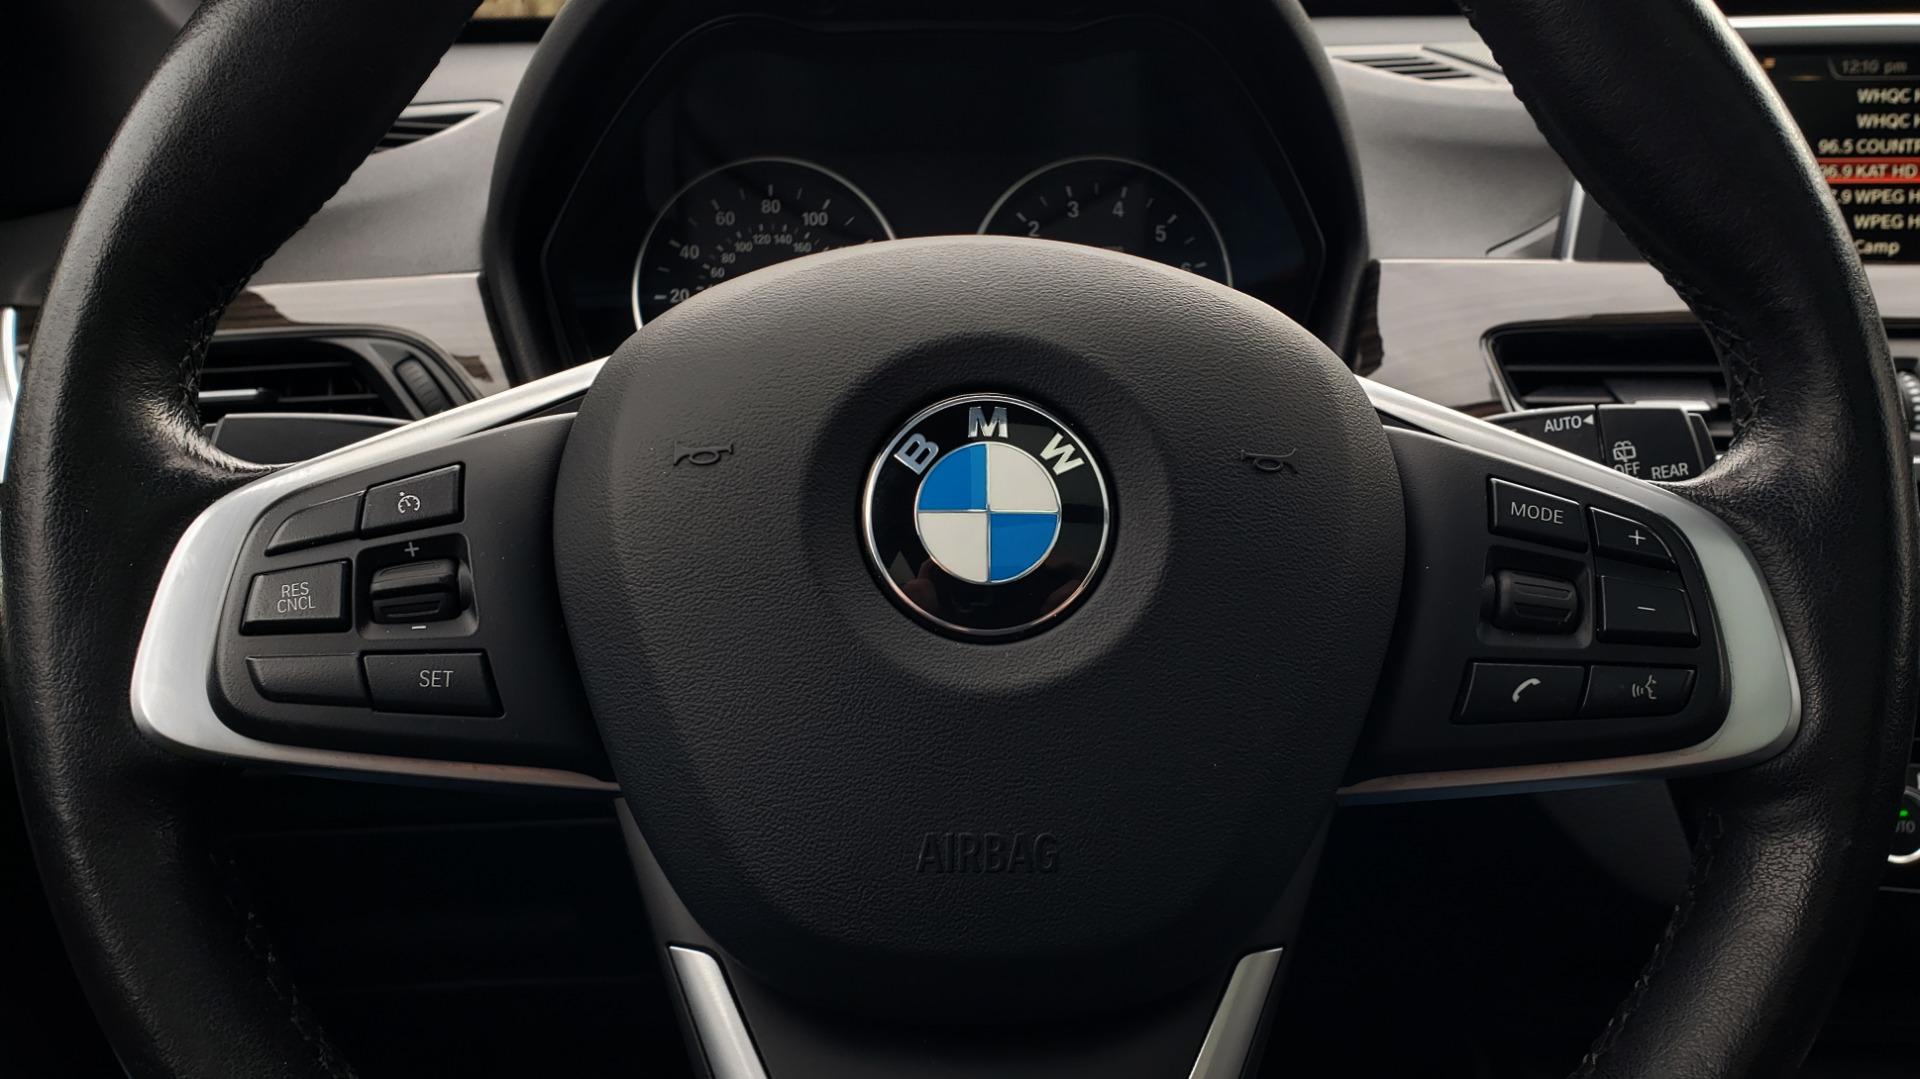 Used 2017 BMW X1 XDRIVE28I / PREM PKG / DRIVER ASST / NAV / CLD WTHR for sale Sold at Formula Imports in Charlotte NC 28227 41